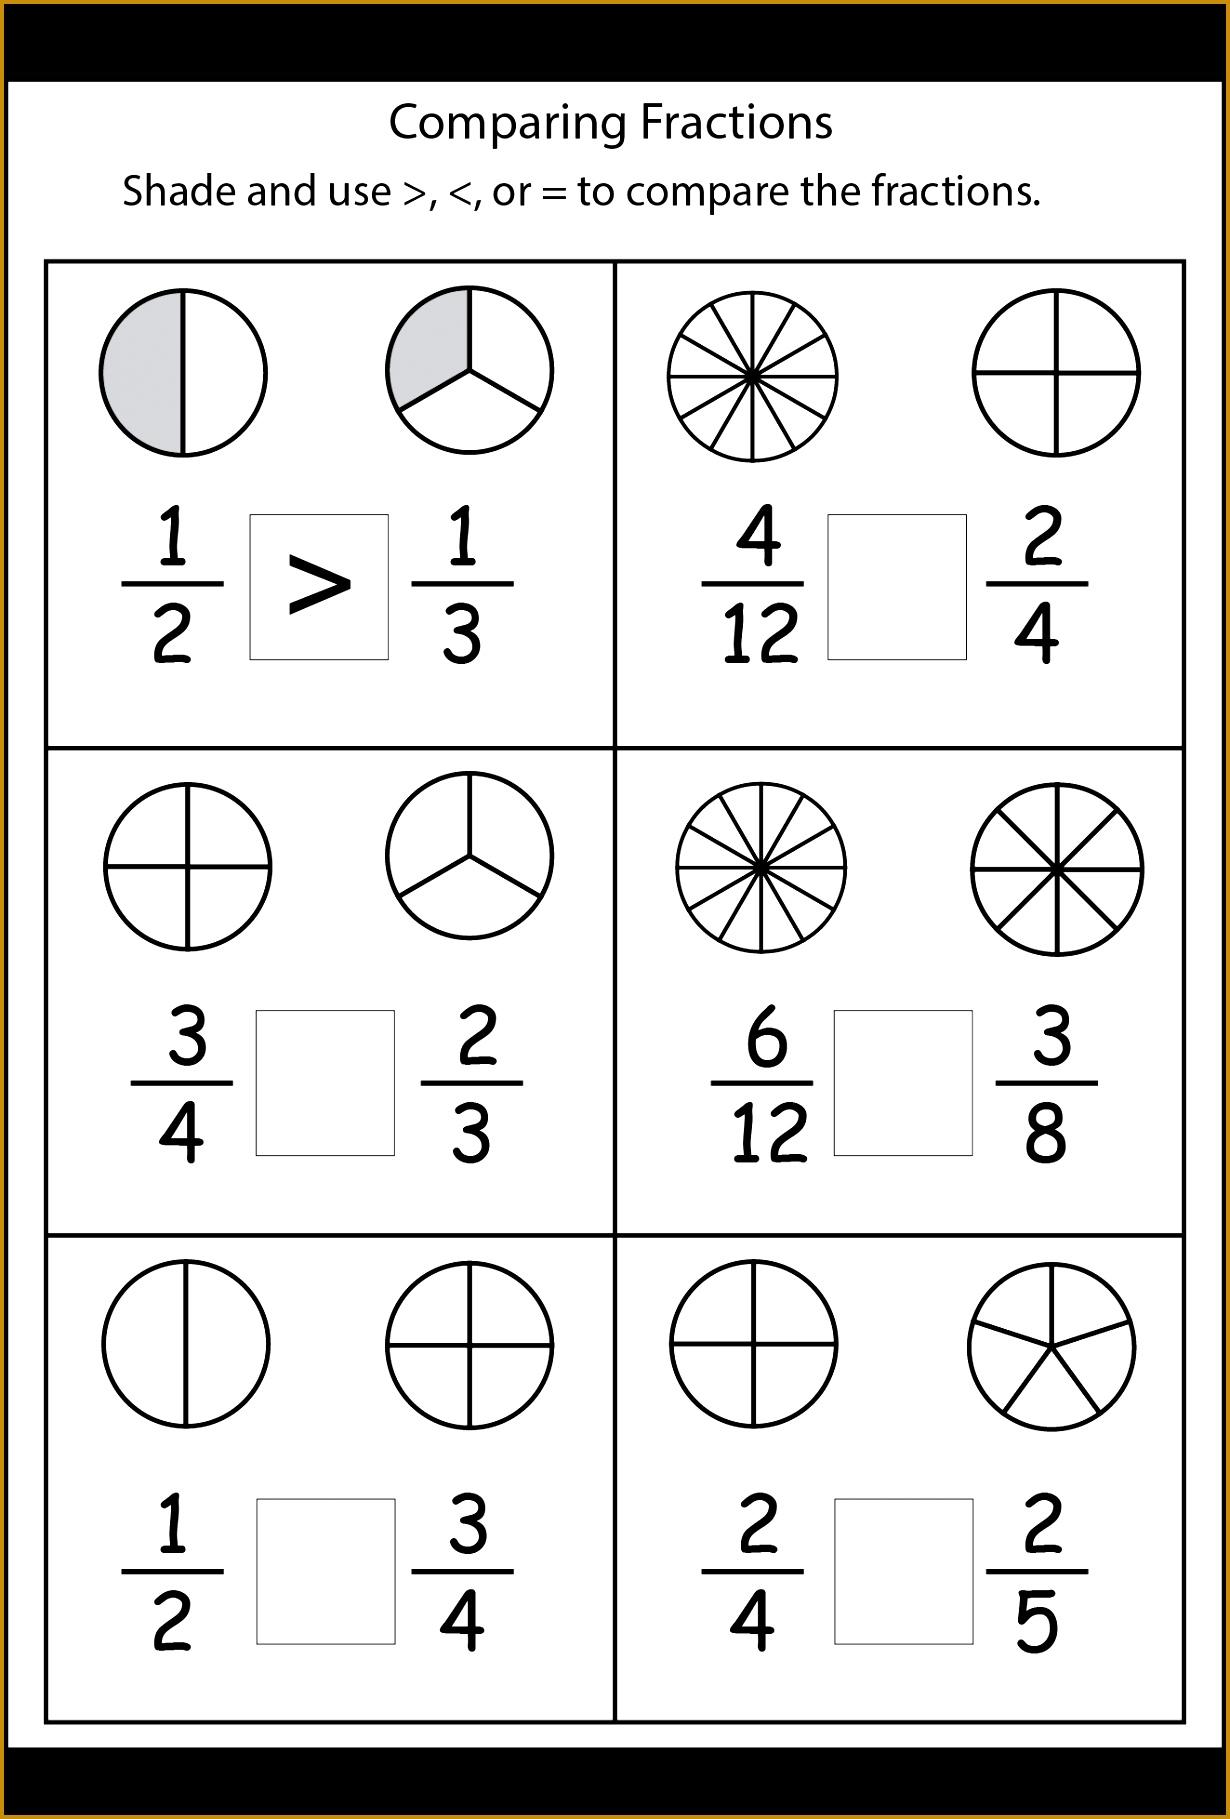 paring fractions worksheets grade math school make pictures blank shapes for older remediation 12301819